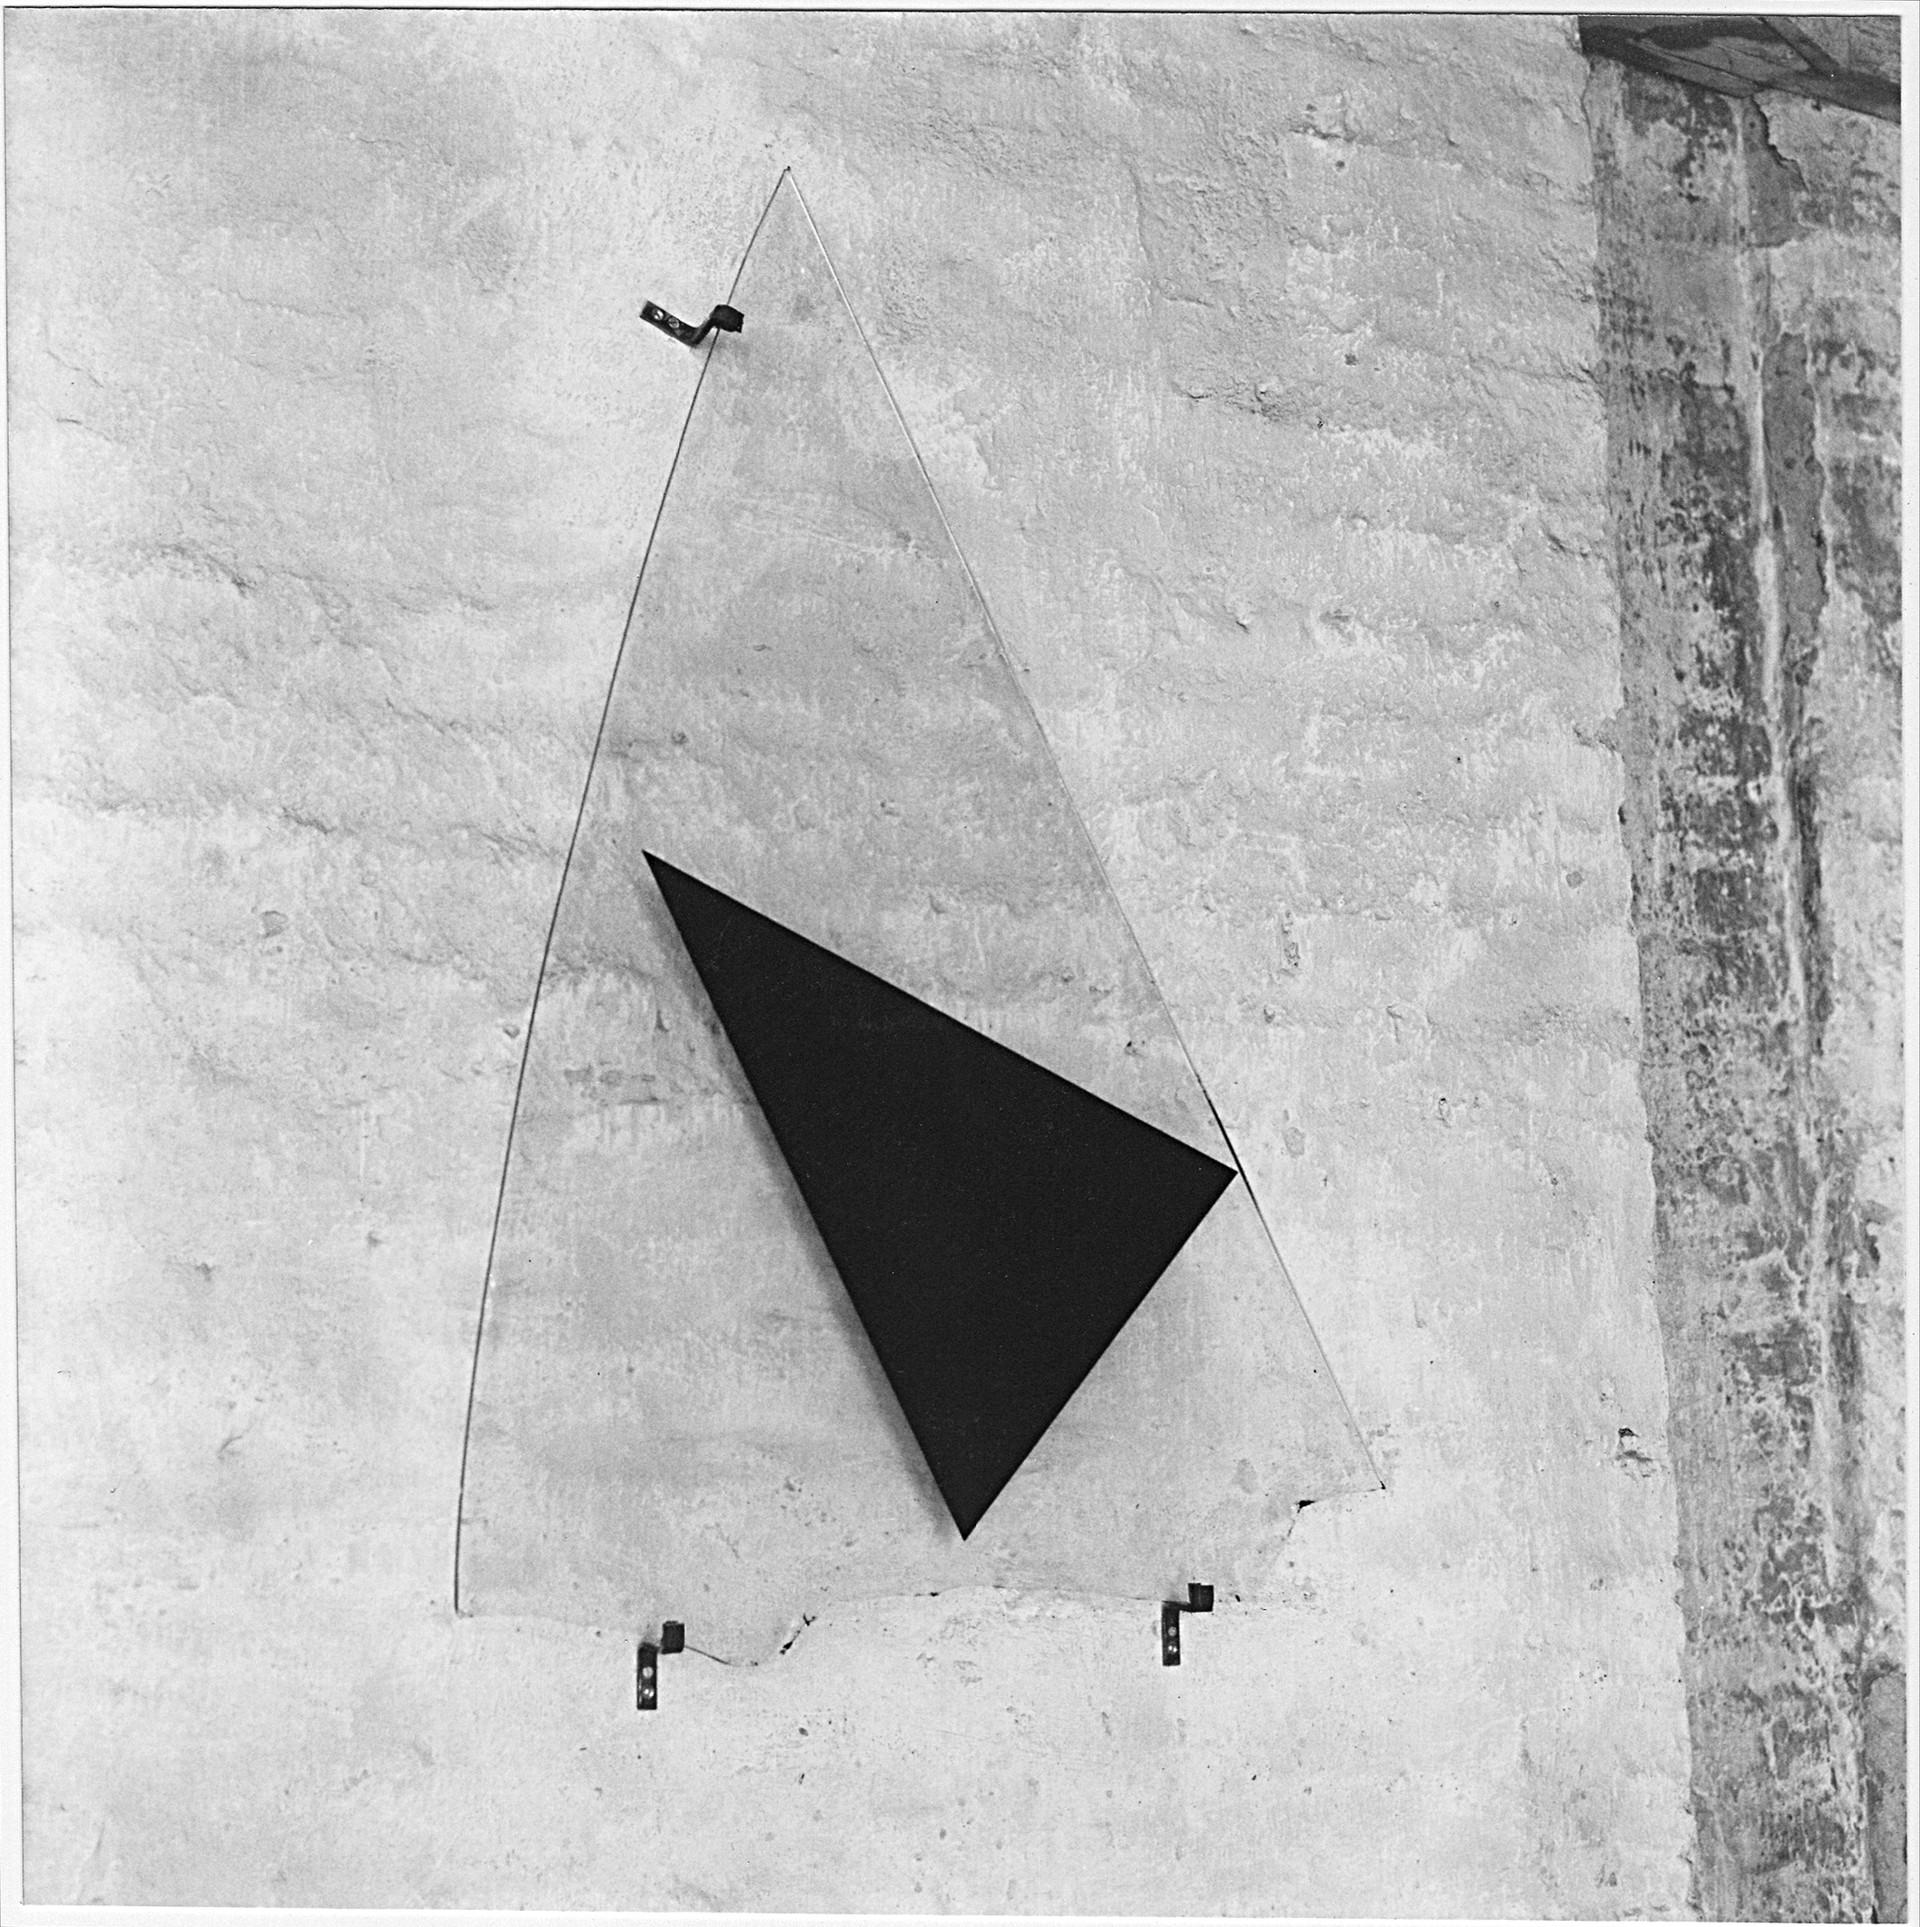 Triangle quelconque